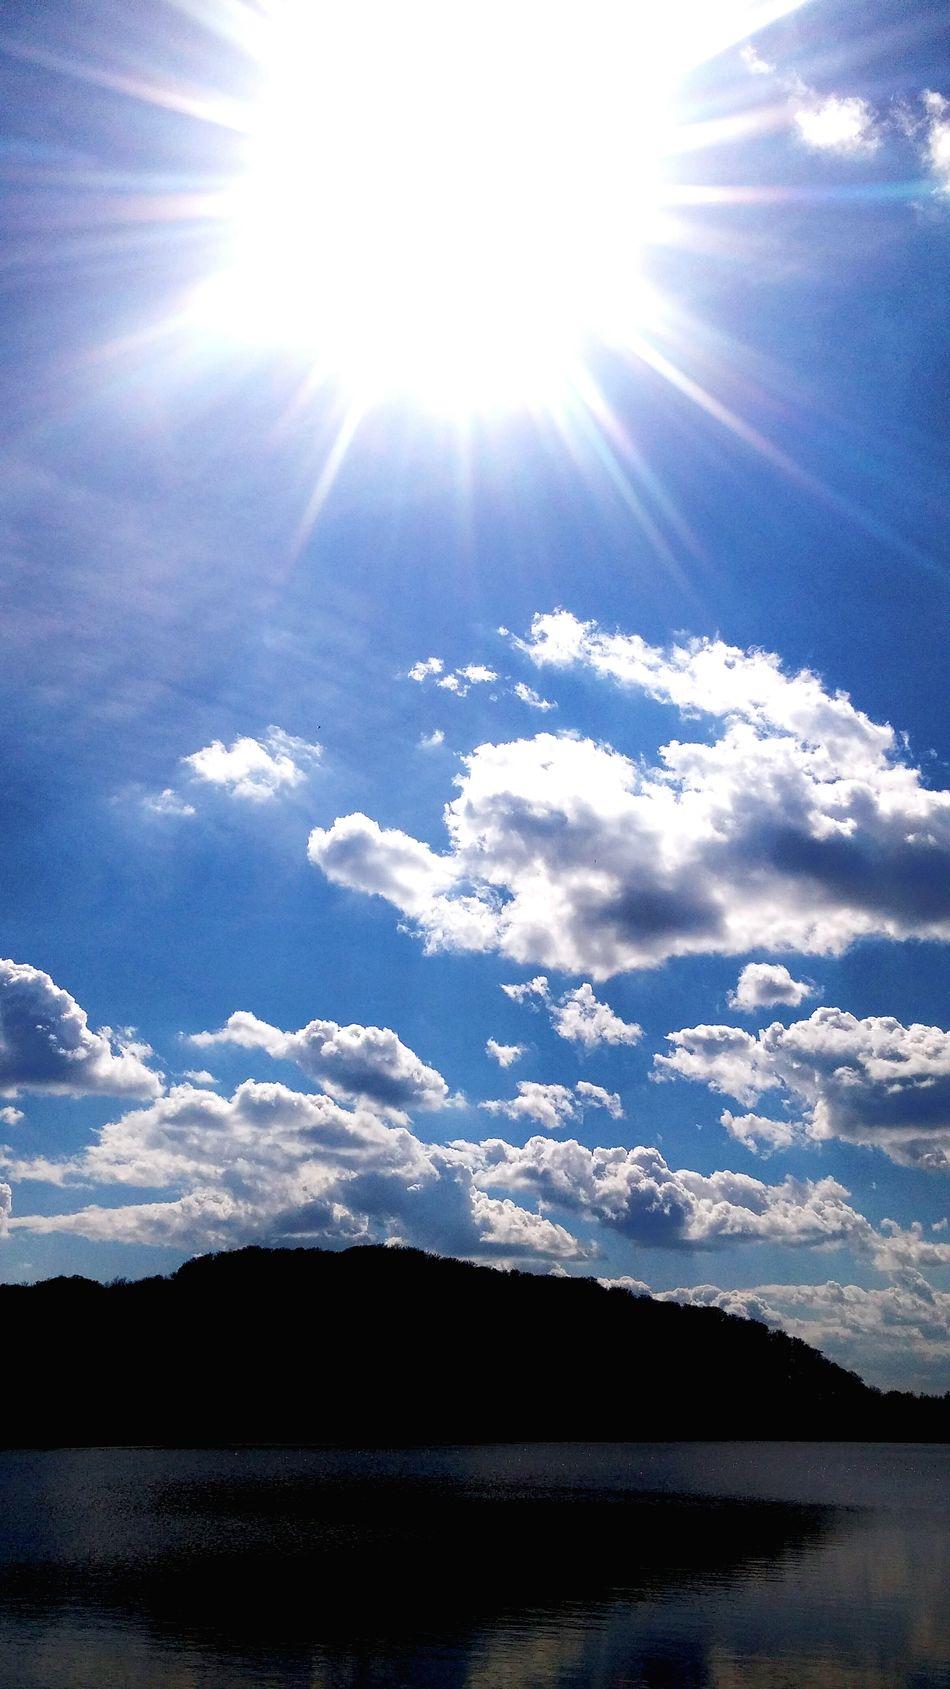 Clouds And Sky Sun Sunshine Sunlight Sunset #sun #clouds #skylovers #sky #nature #beautifulinnature #naturalbeauty #photography #landscape Clouds Cloud And Sky Cloudporn Sky And Clouds Skyporn Sky_collection Teflection Water Reflections